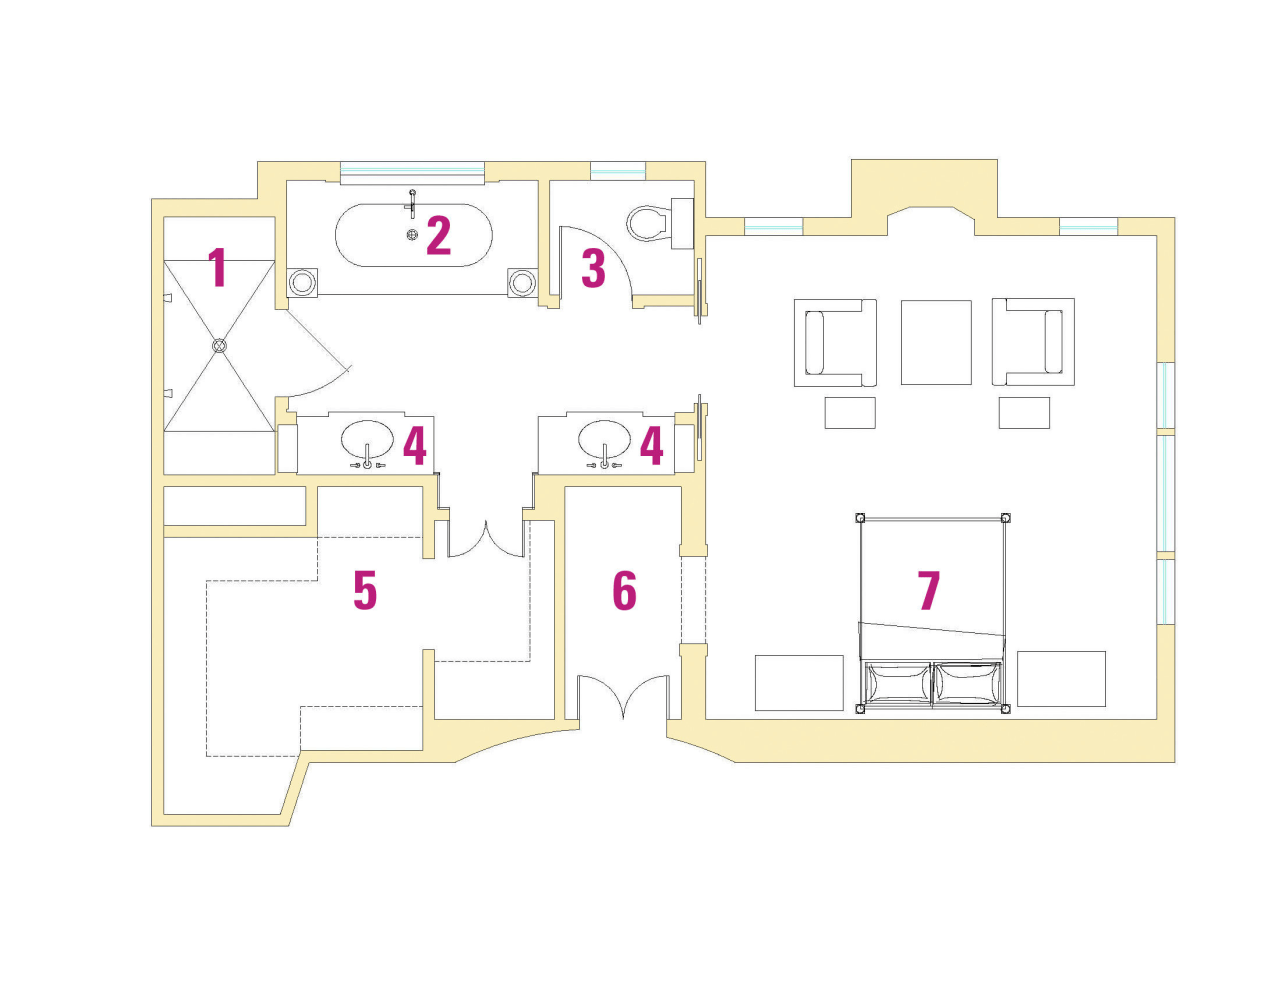 Legend Plan area, design, diagram, floor plan, line, plan, product design, property, real estate, text, white